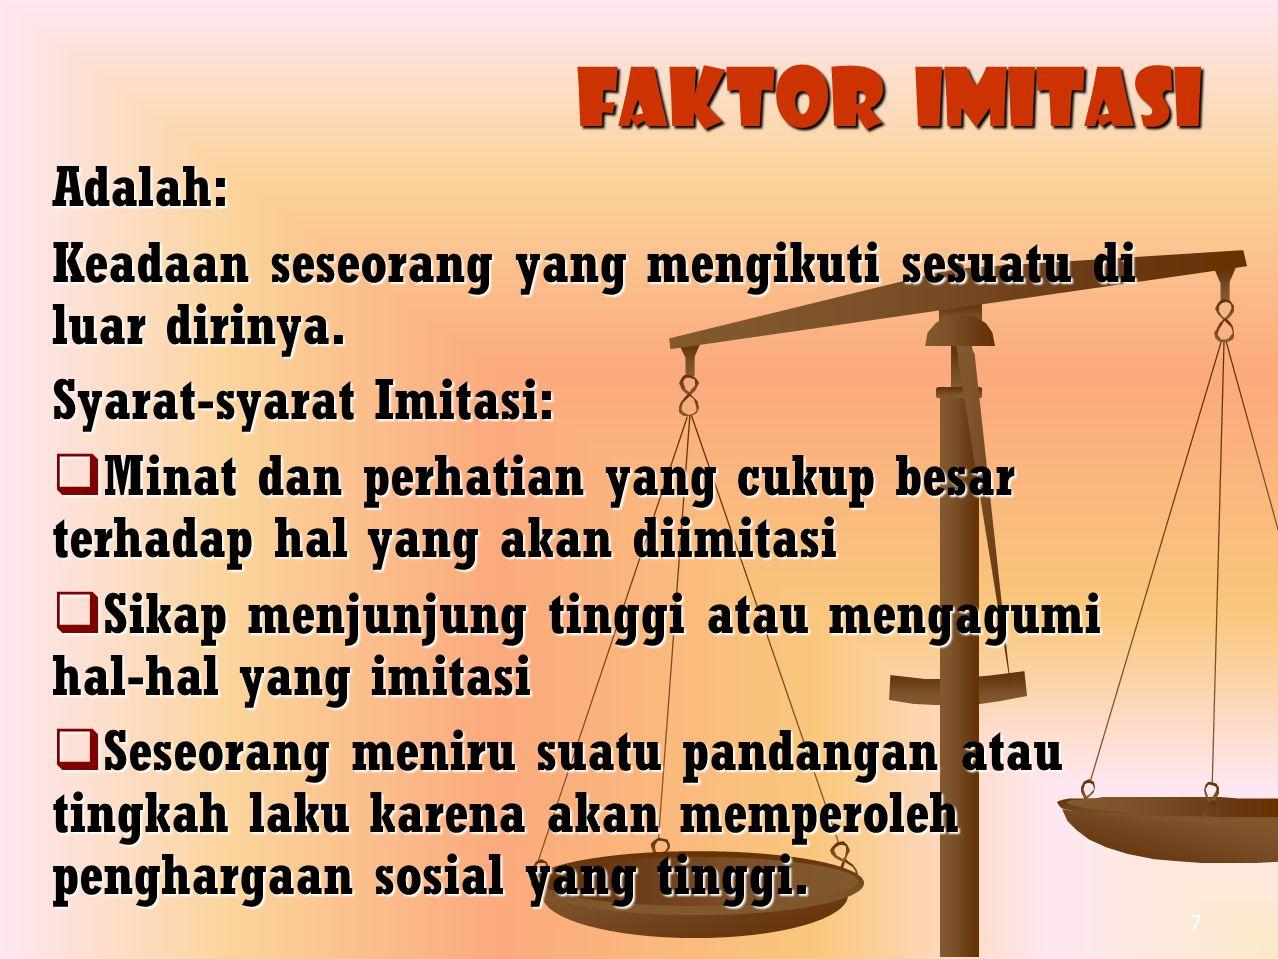 7 Faktor imitasi Adalah: Keadaan seseorang yang mengikuti sesuatu di luar dirinya. Syarat-syarat Imitasi:  Minat dan perhatian yang cukup besar terha